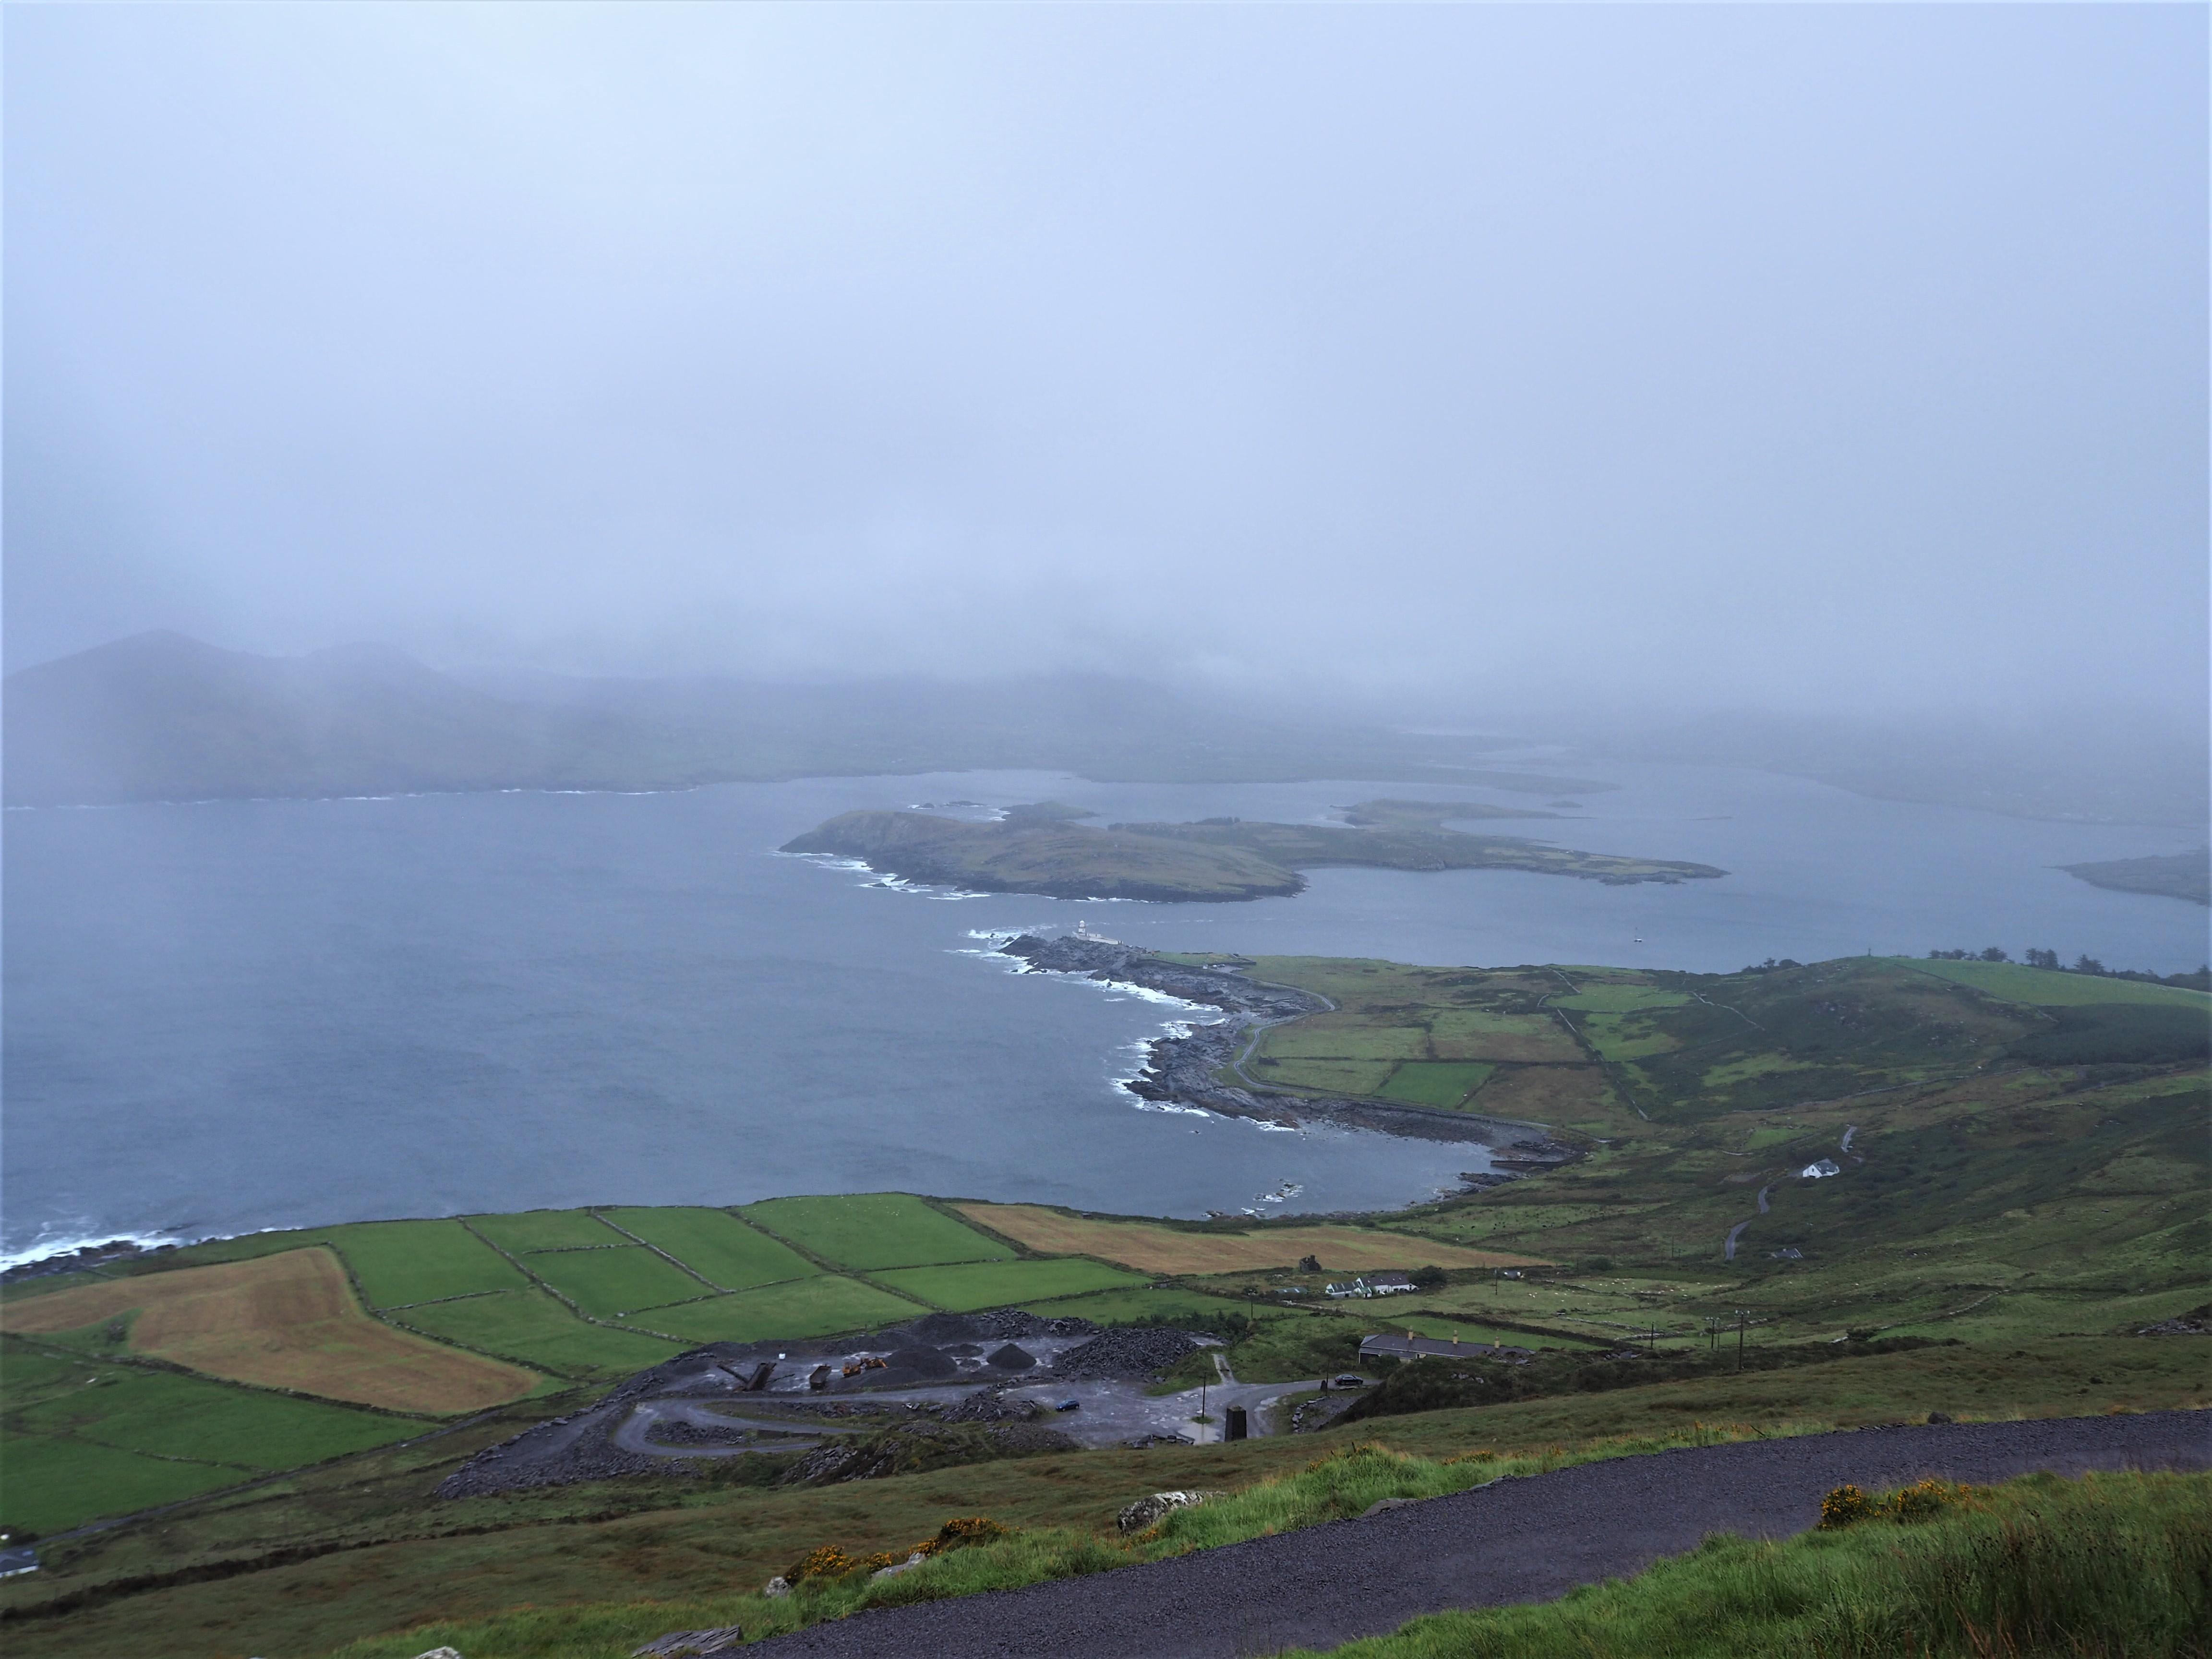 Valentia Island, Ring of kerry, Irlande Vue sur le phare